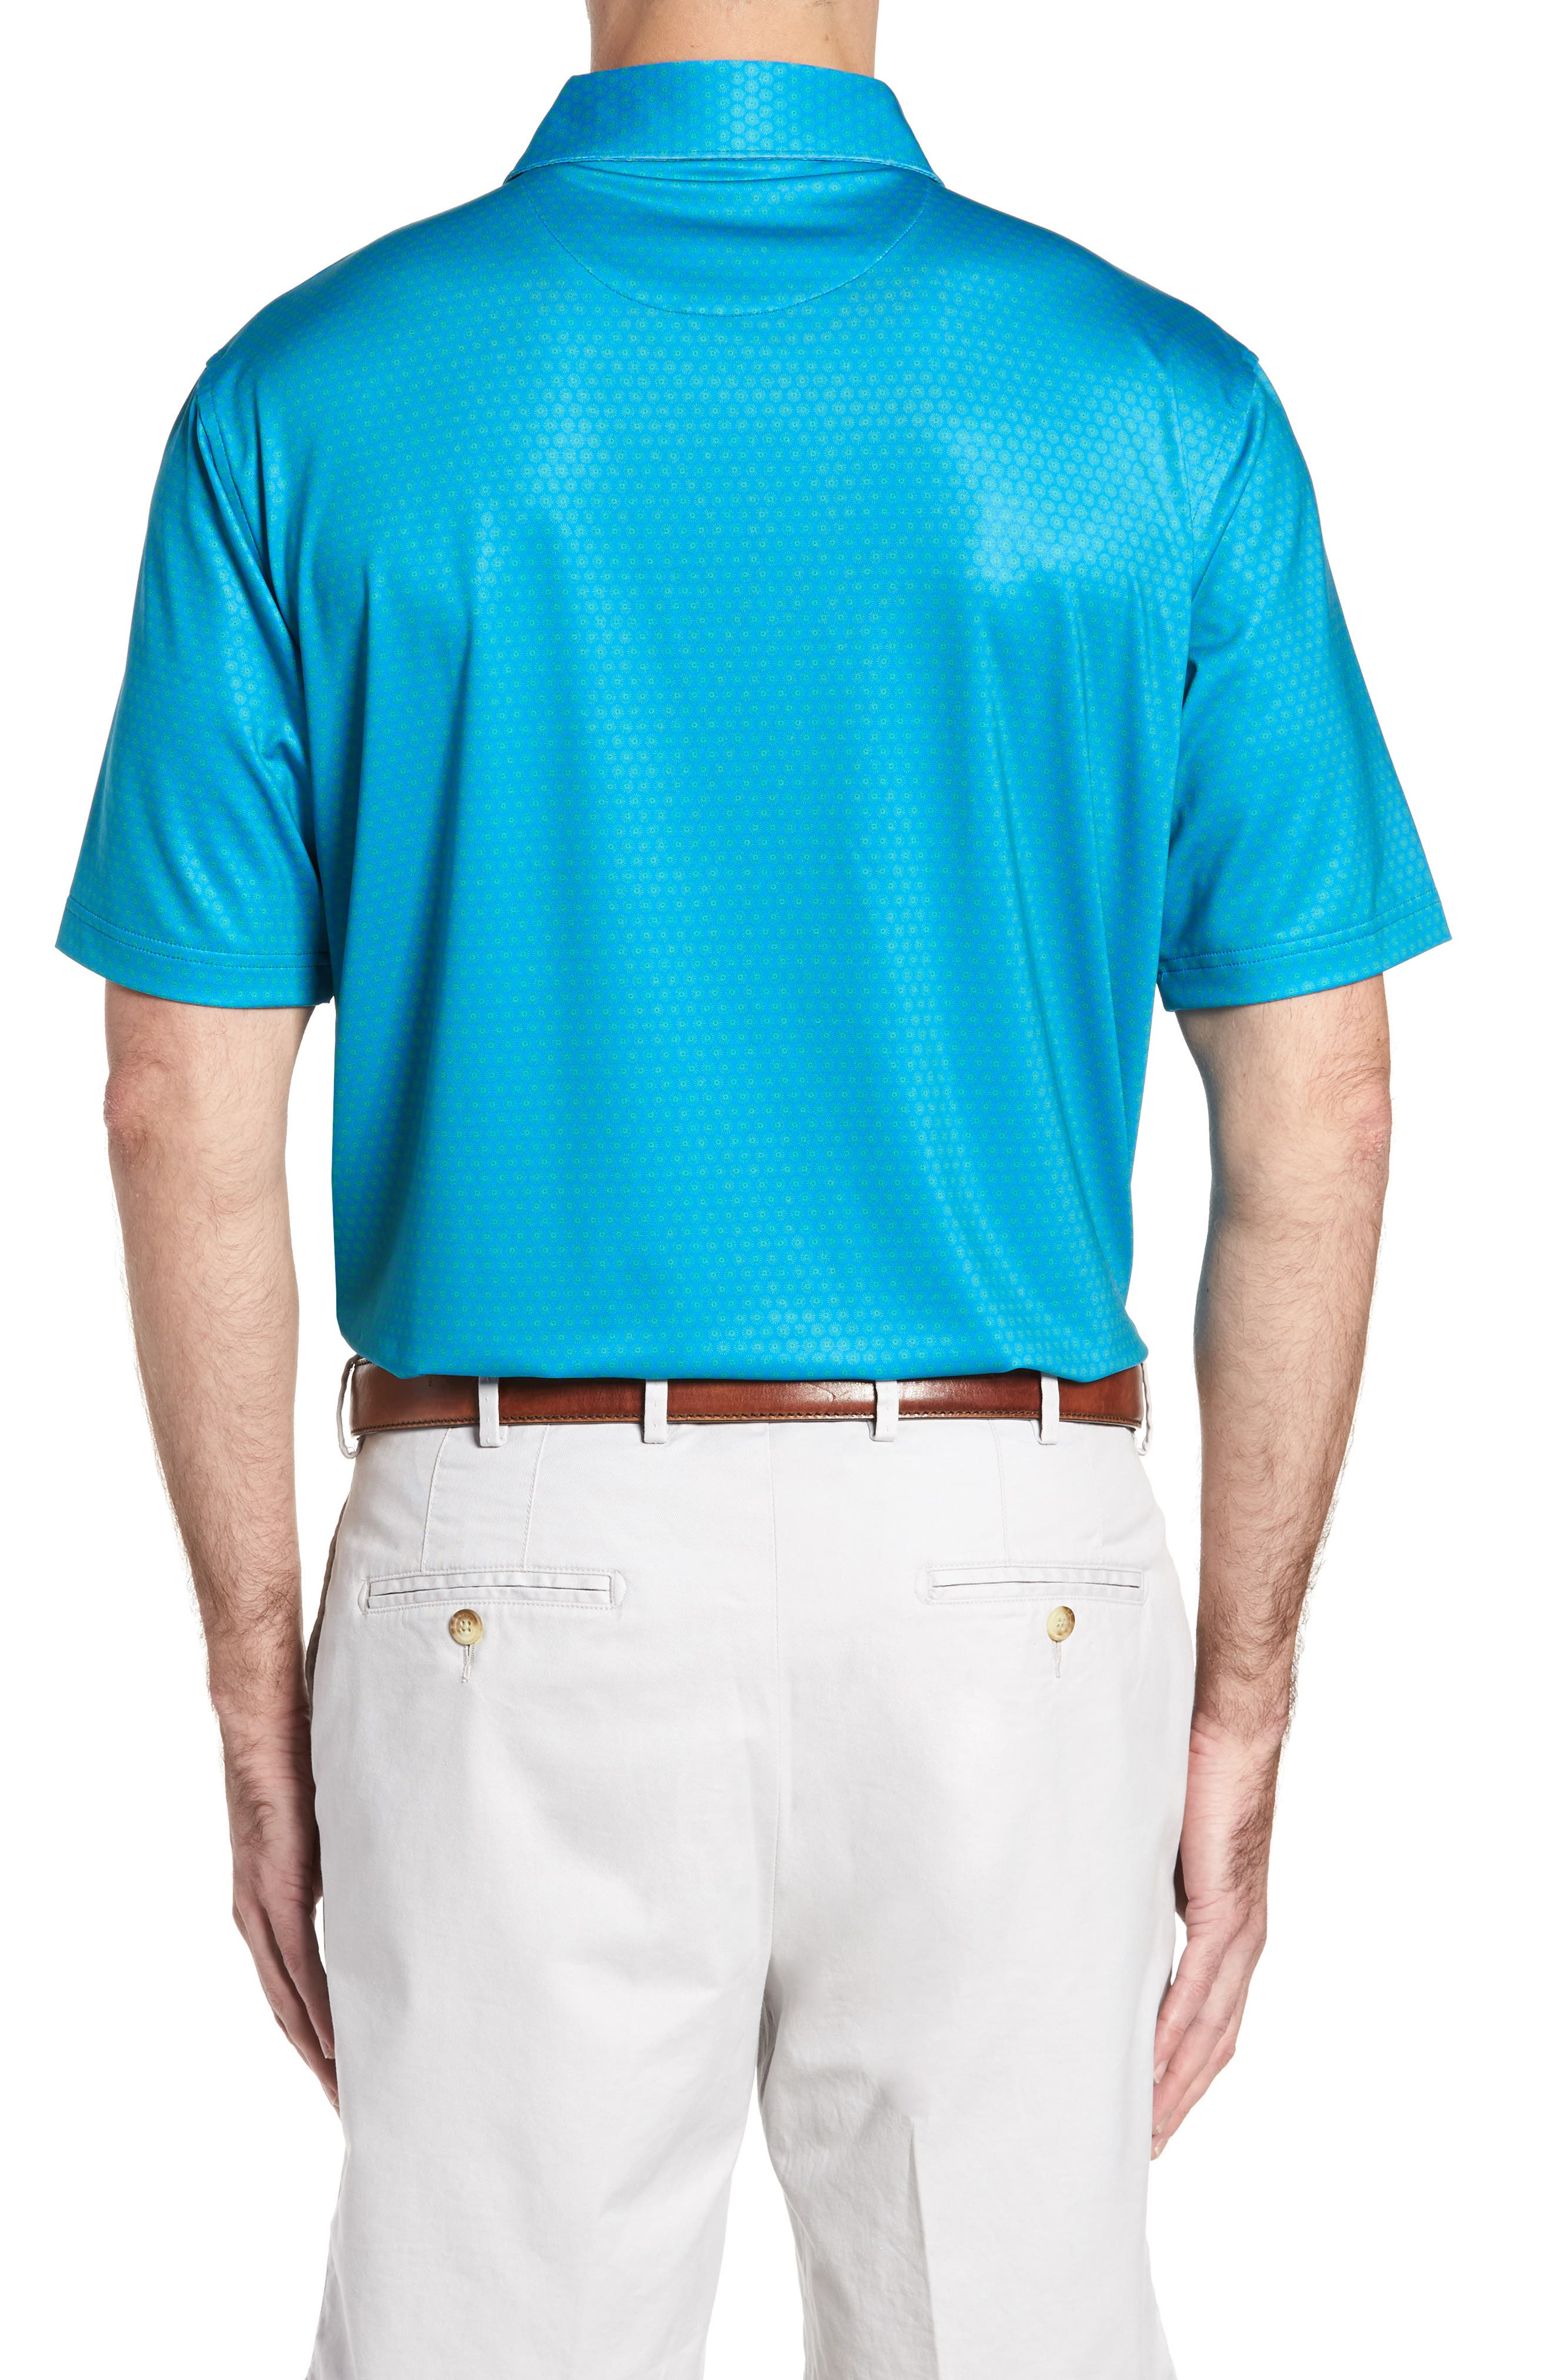 Sean Mata Sunburst Stretch Jersey Polo,                             Alternate thumbnail 2, color,                             403